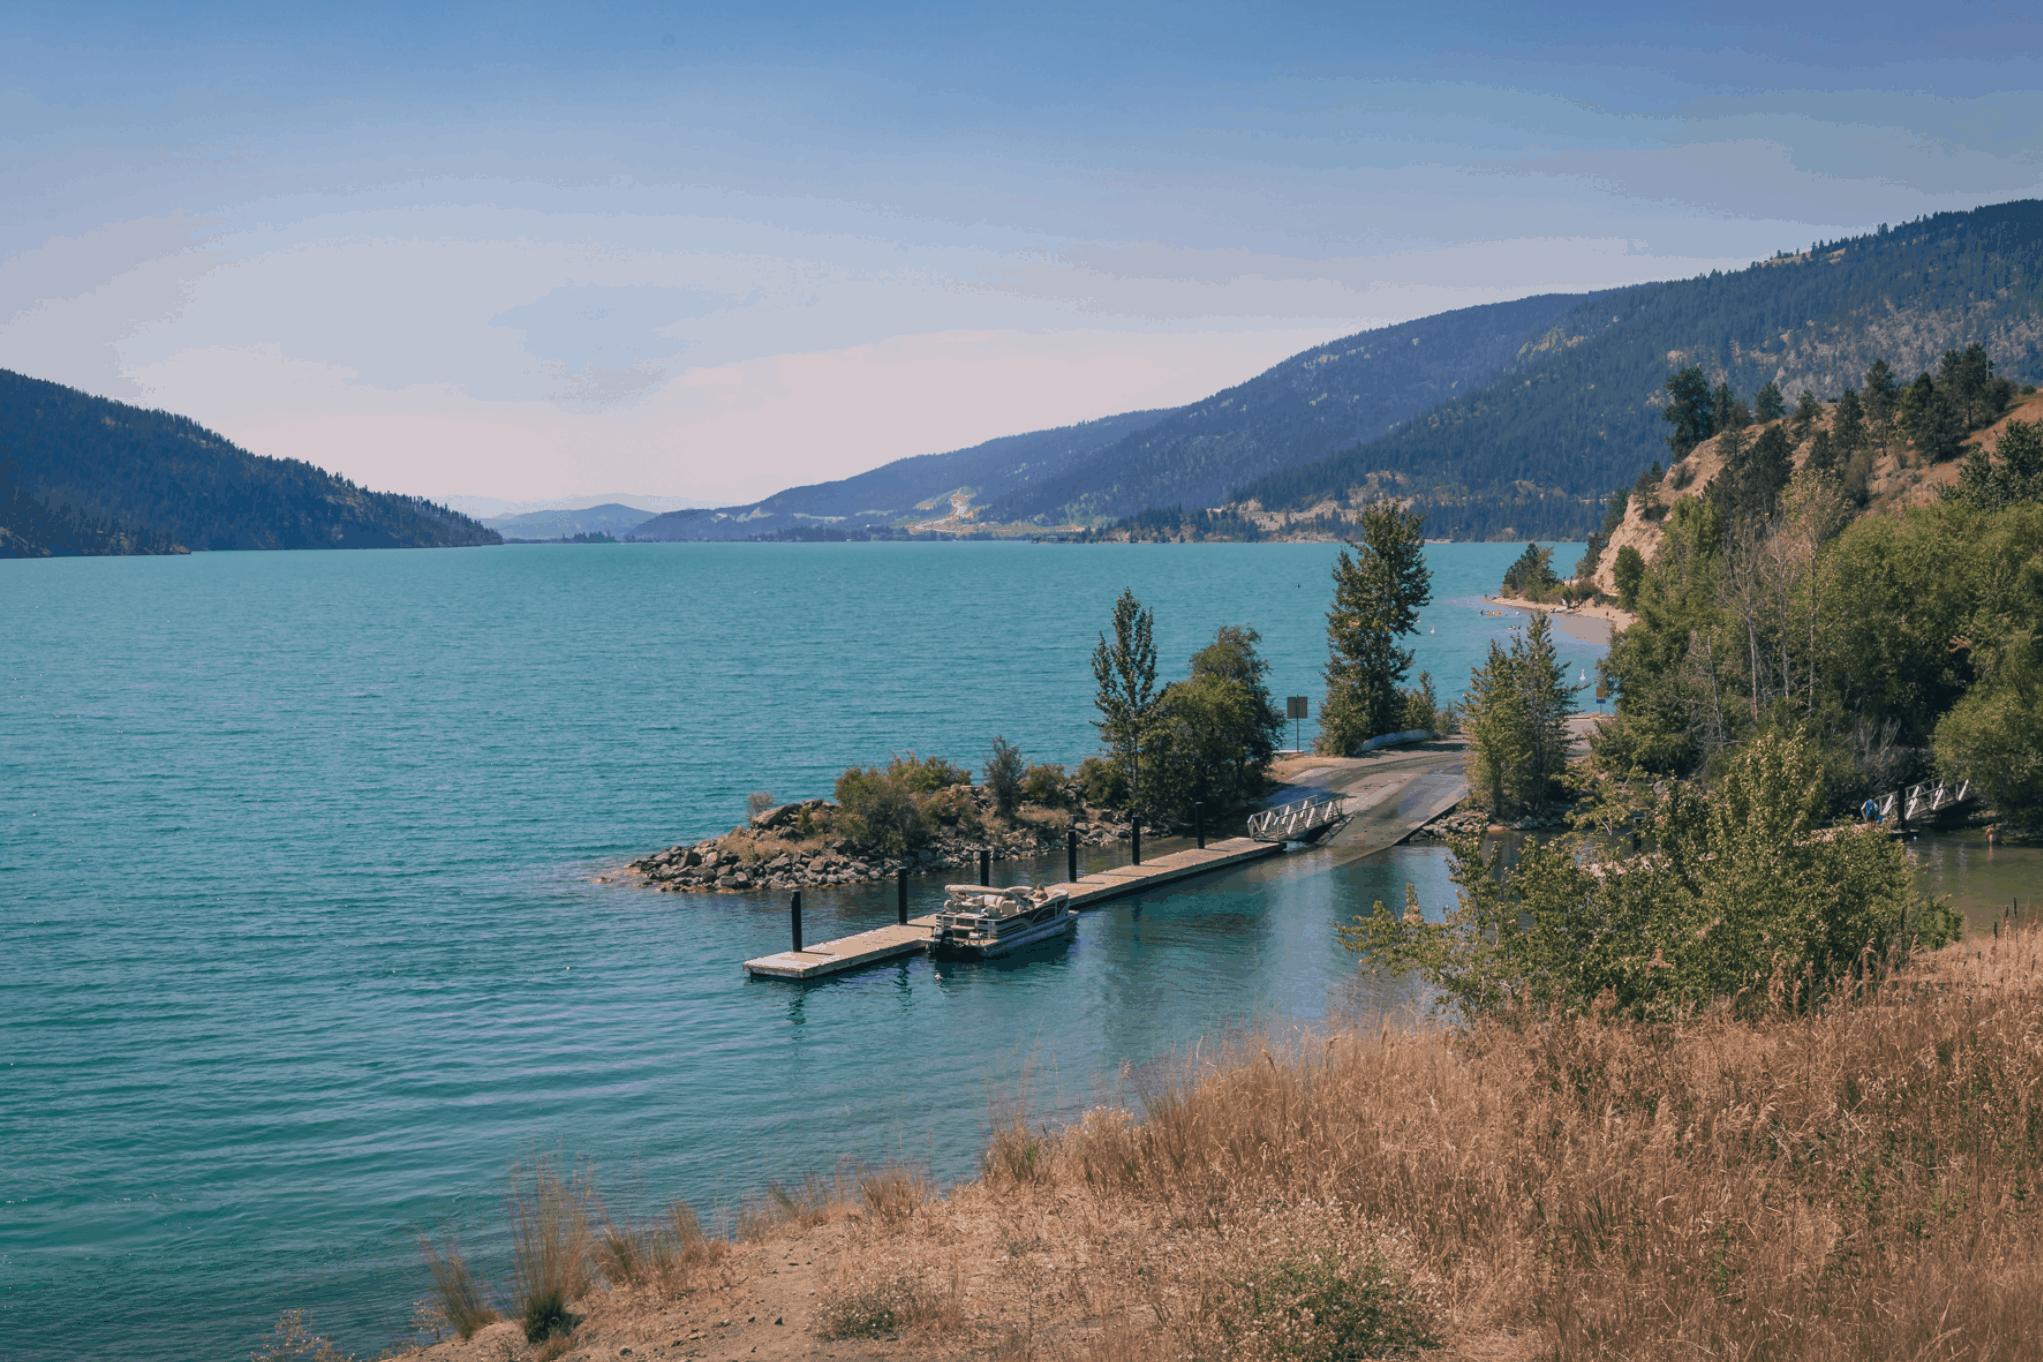 Kalamalka Lake Boat Launch